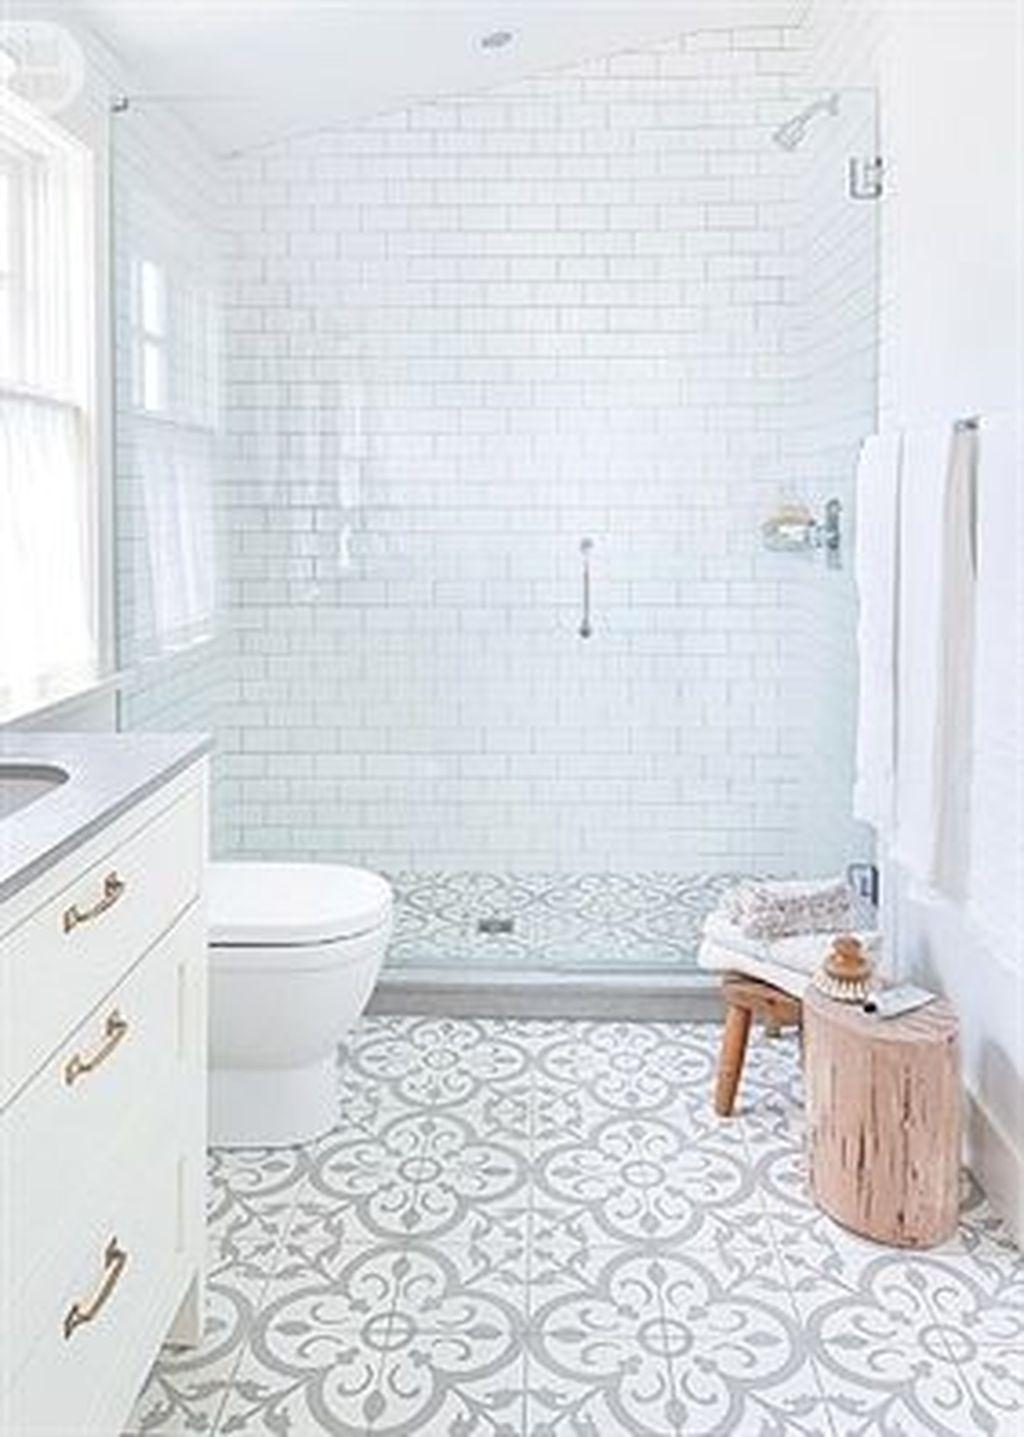 Inspiring Bathroom Tile Ideas 16